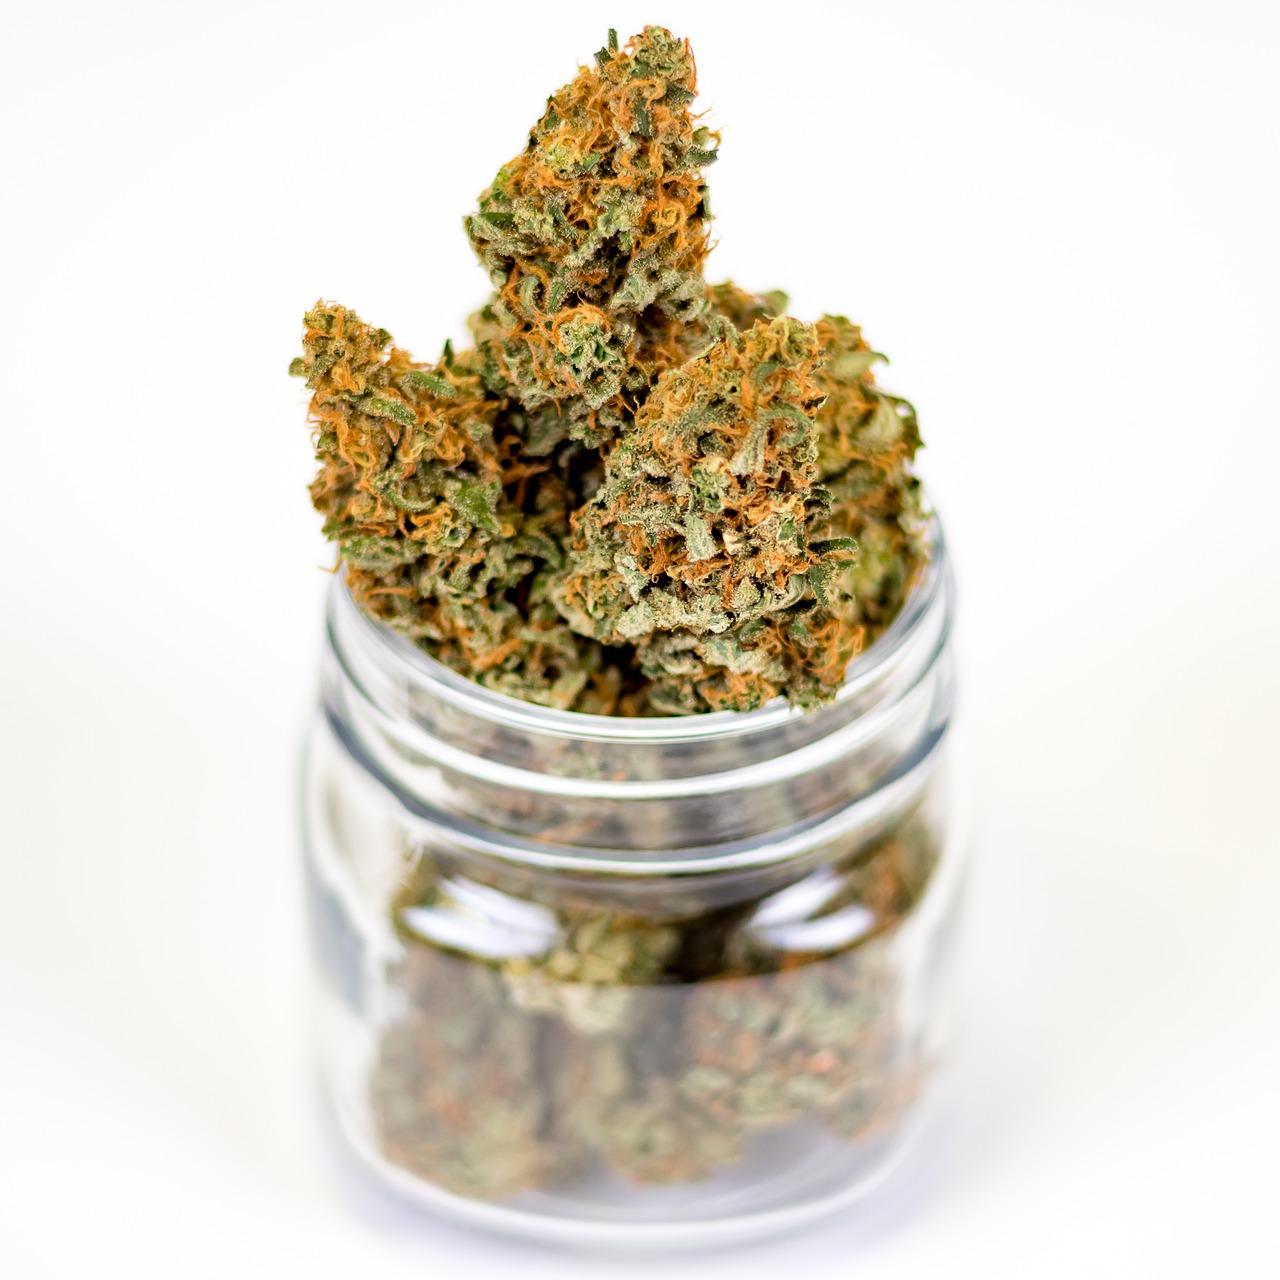 mixing weed and antibiotics